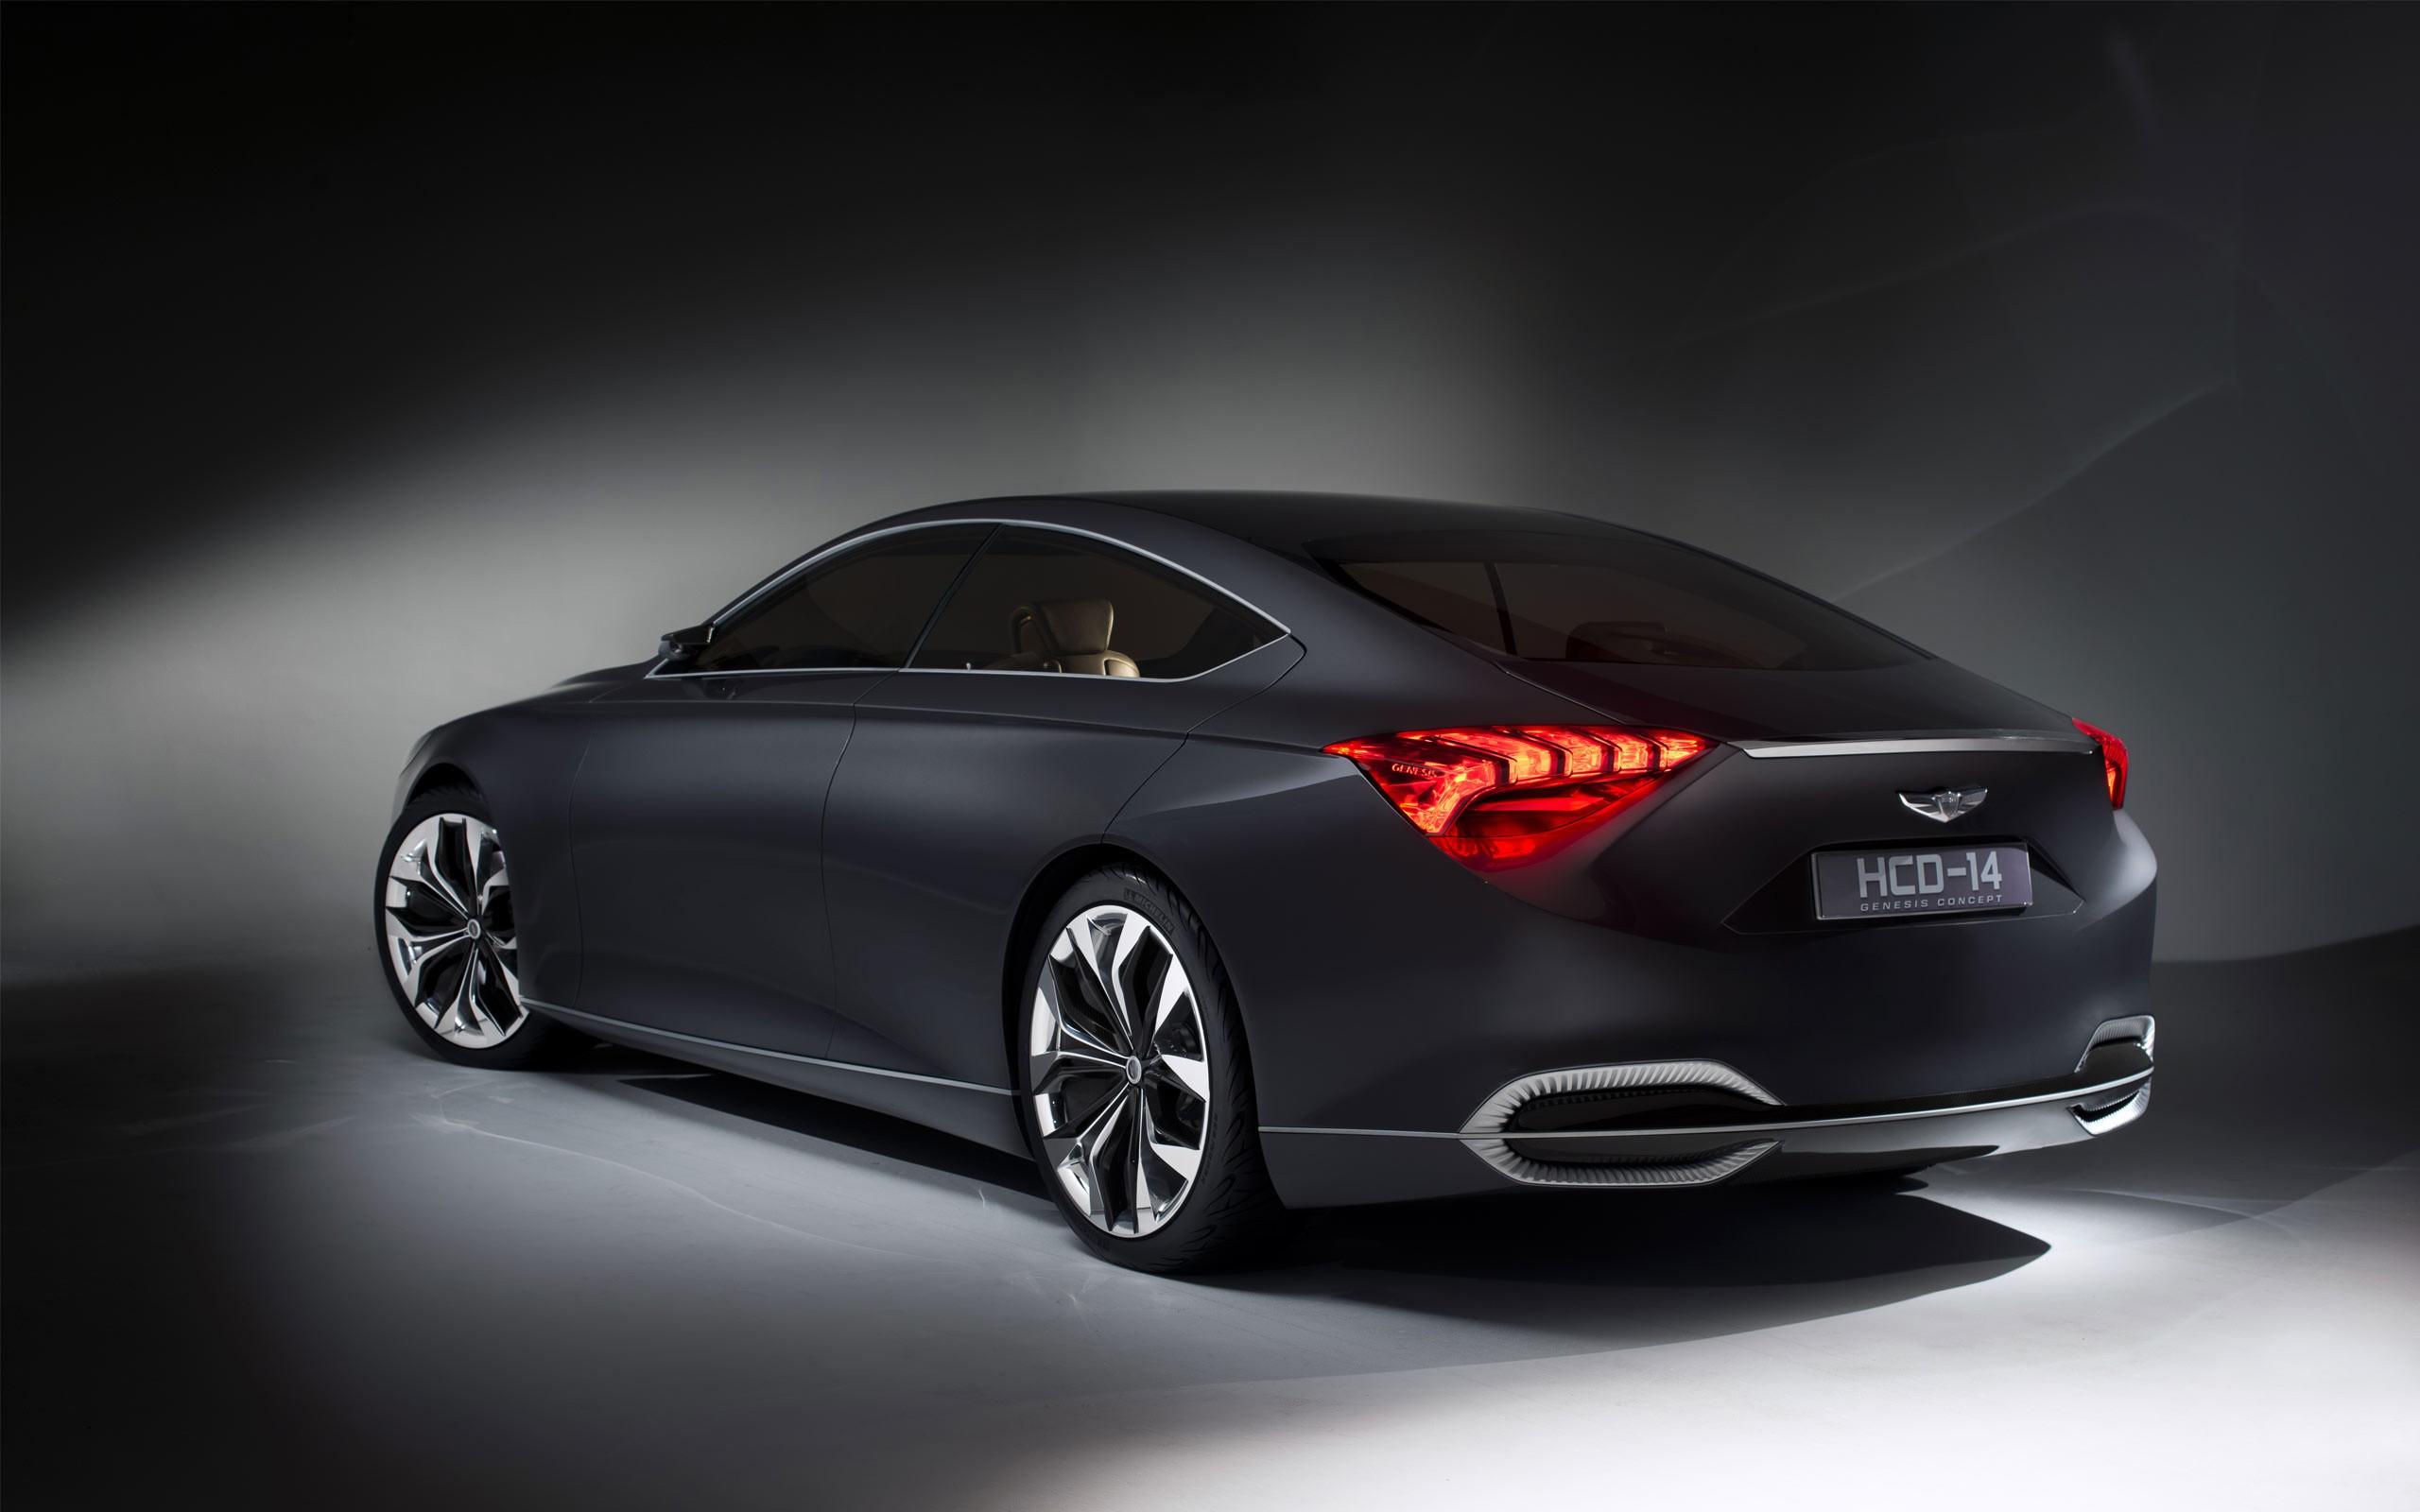 2013 Hyundai HCD 14 Genesis Concept 2 Wallpaper | HD Car ...